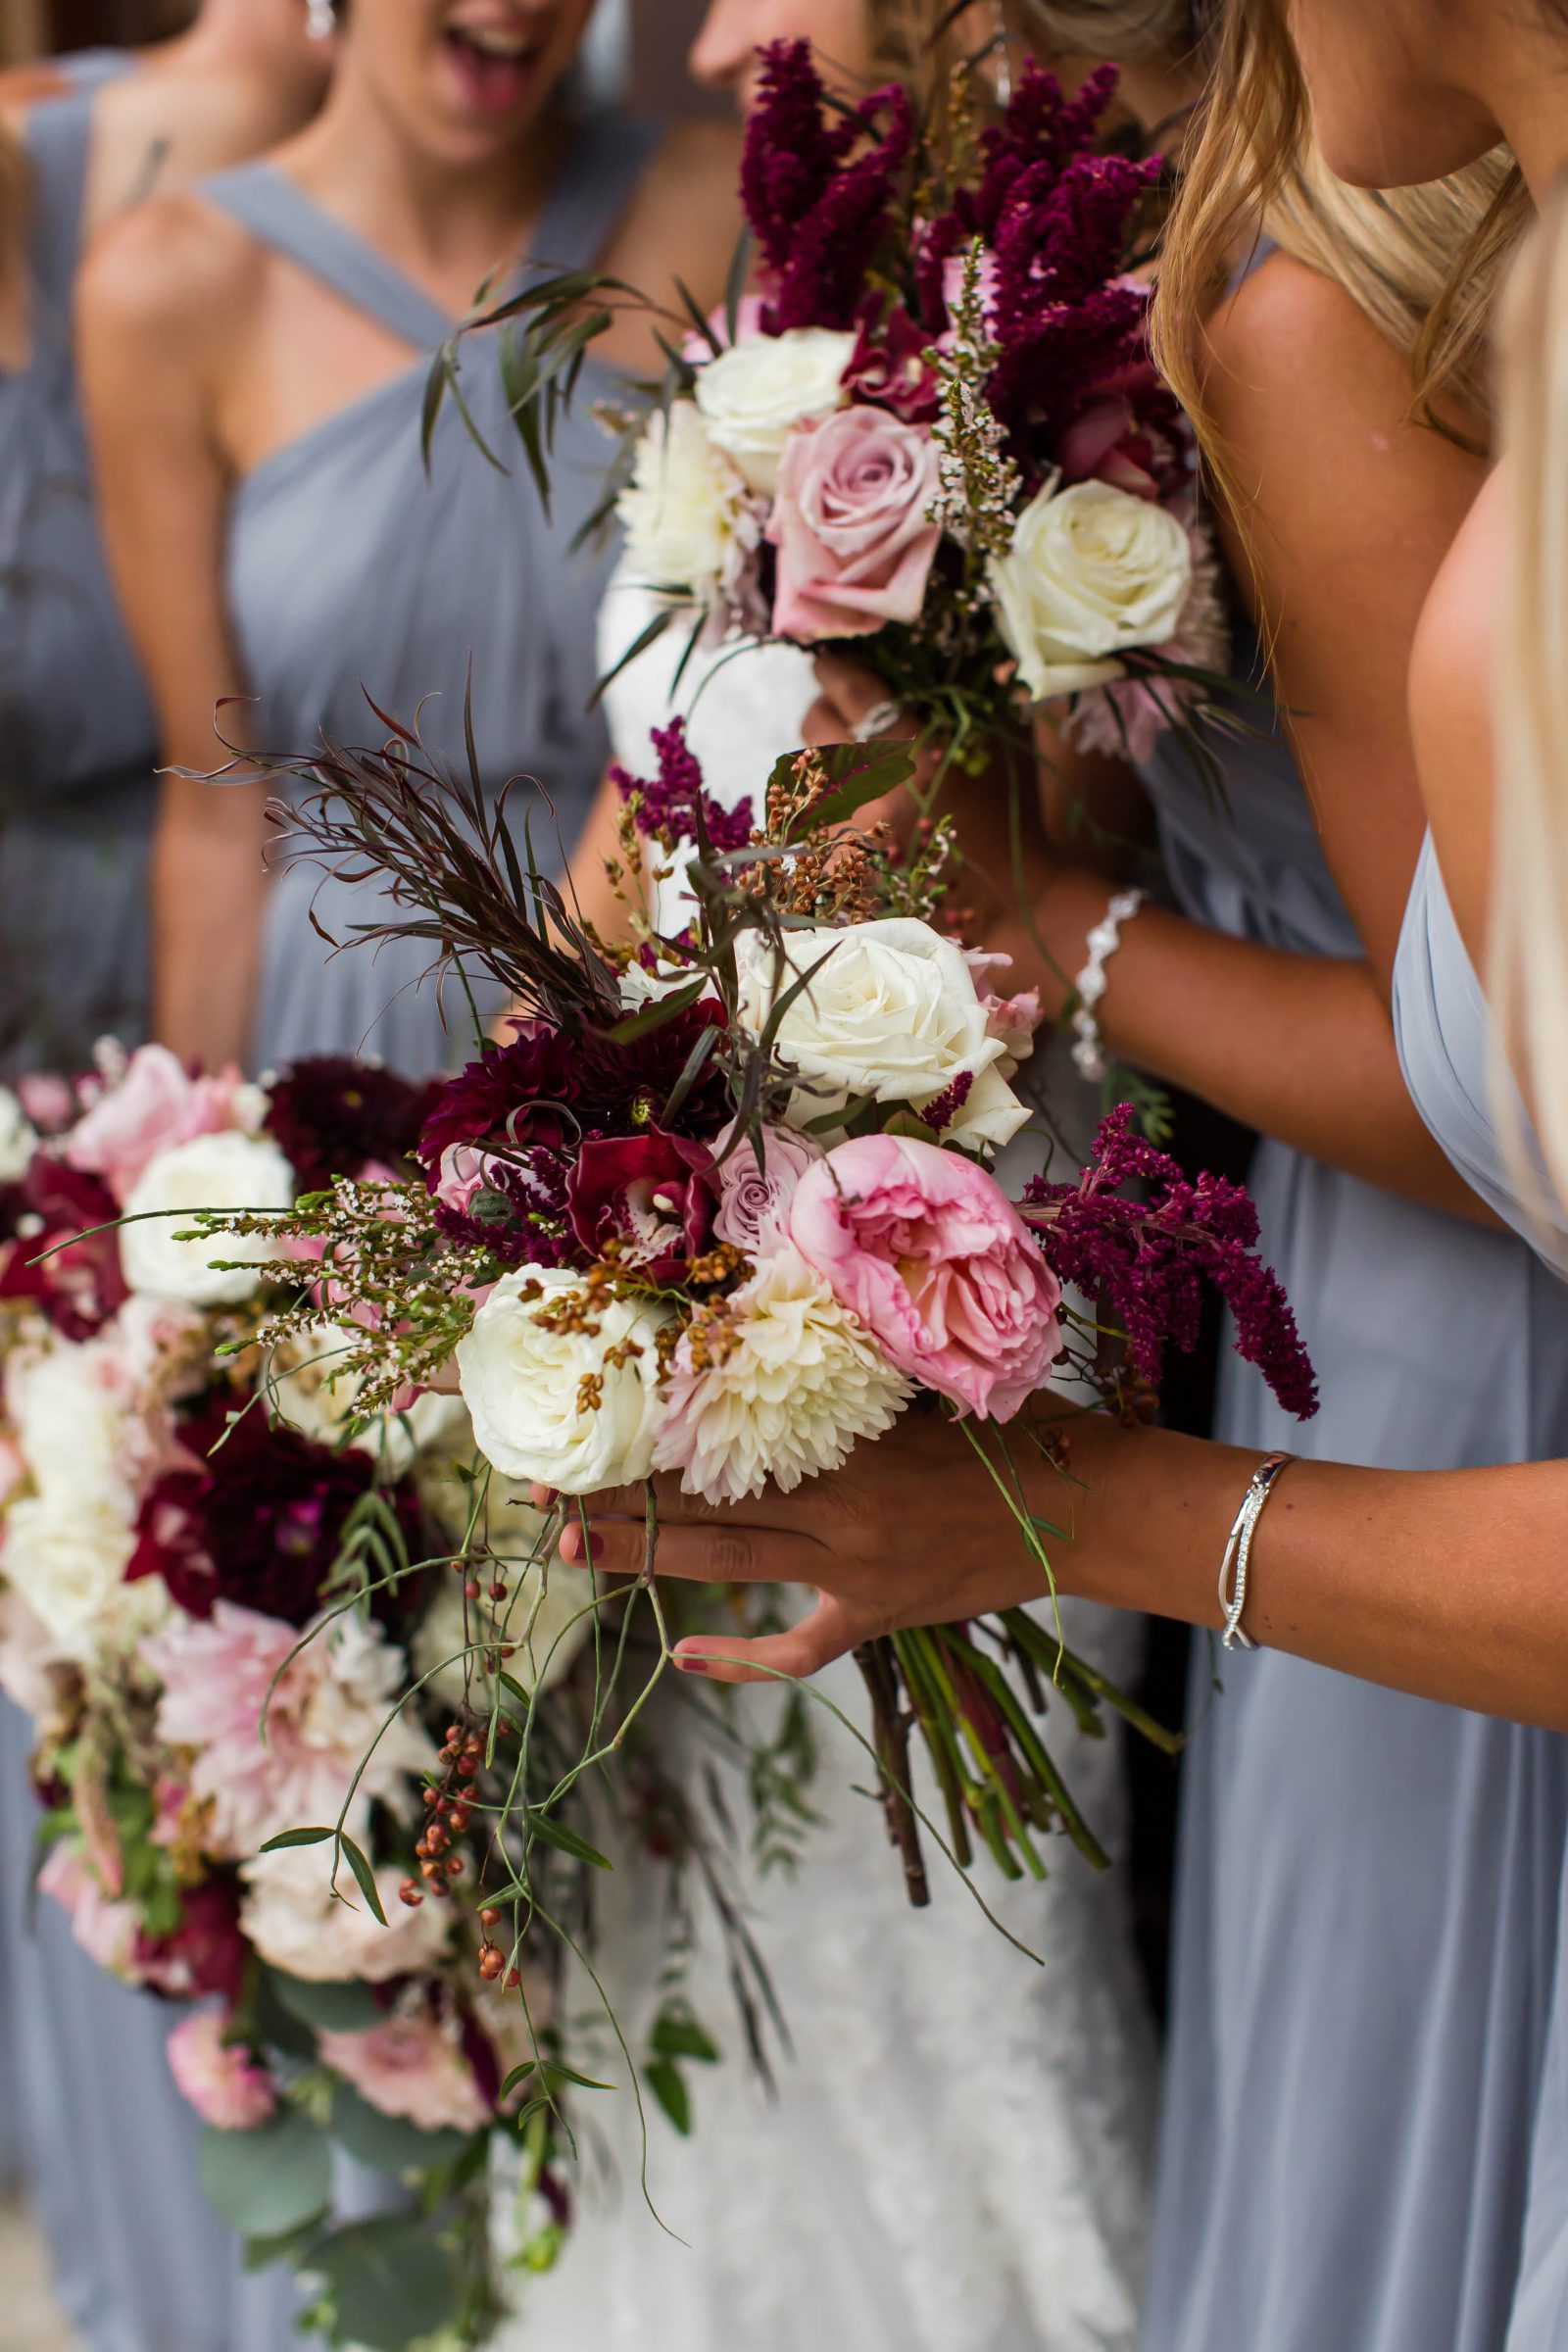 sunny-hill-wedding-venue-loren-jackson-photography-45